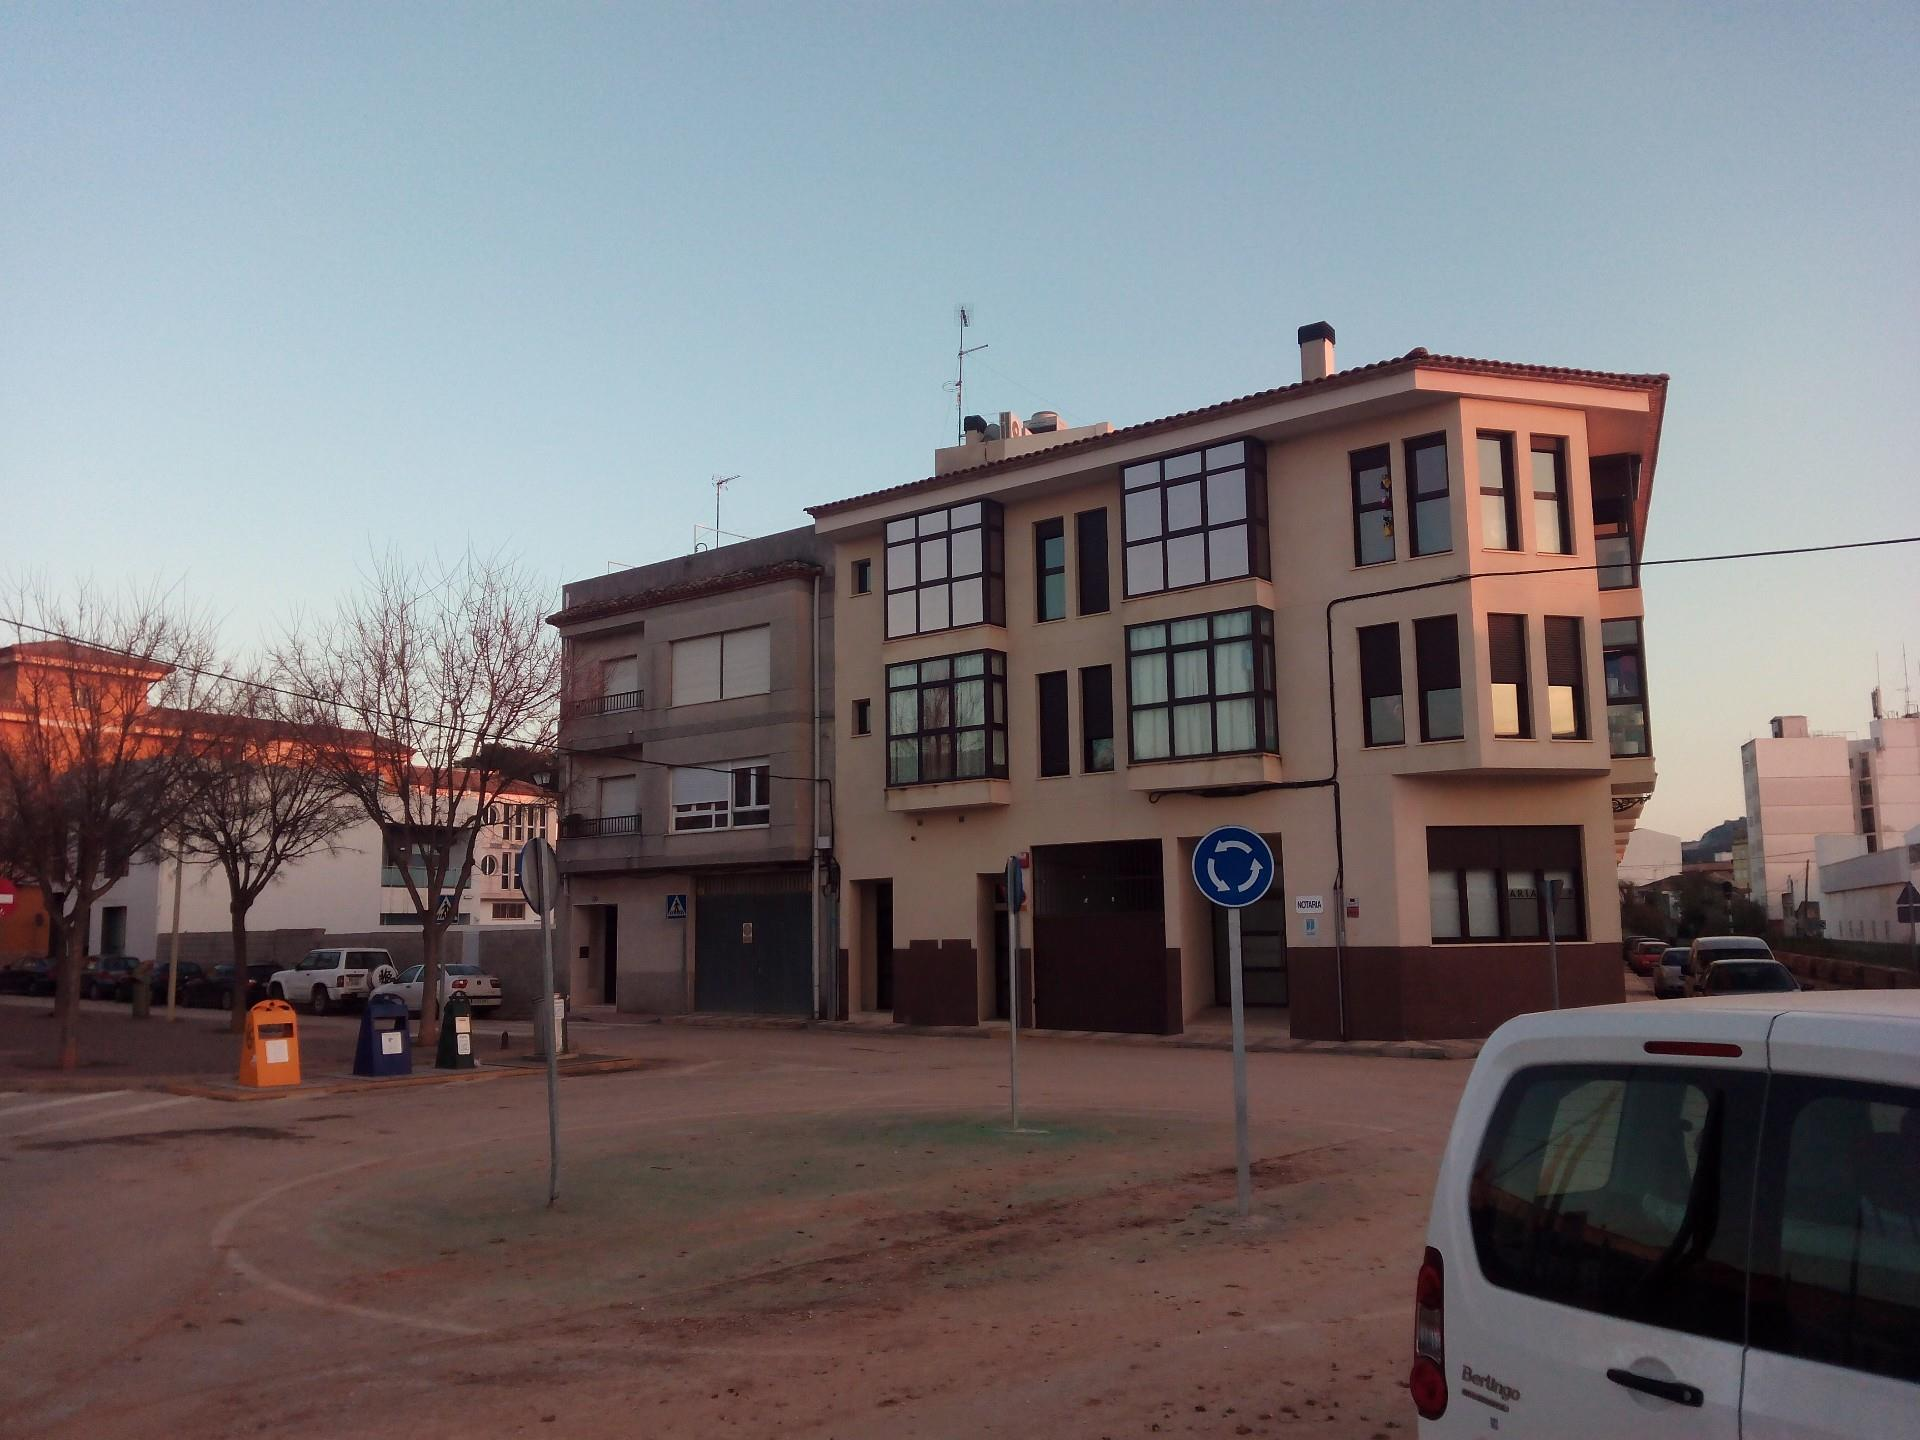 Dúplex  Calle paet. Gata de gorgos / calle paet